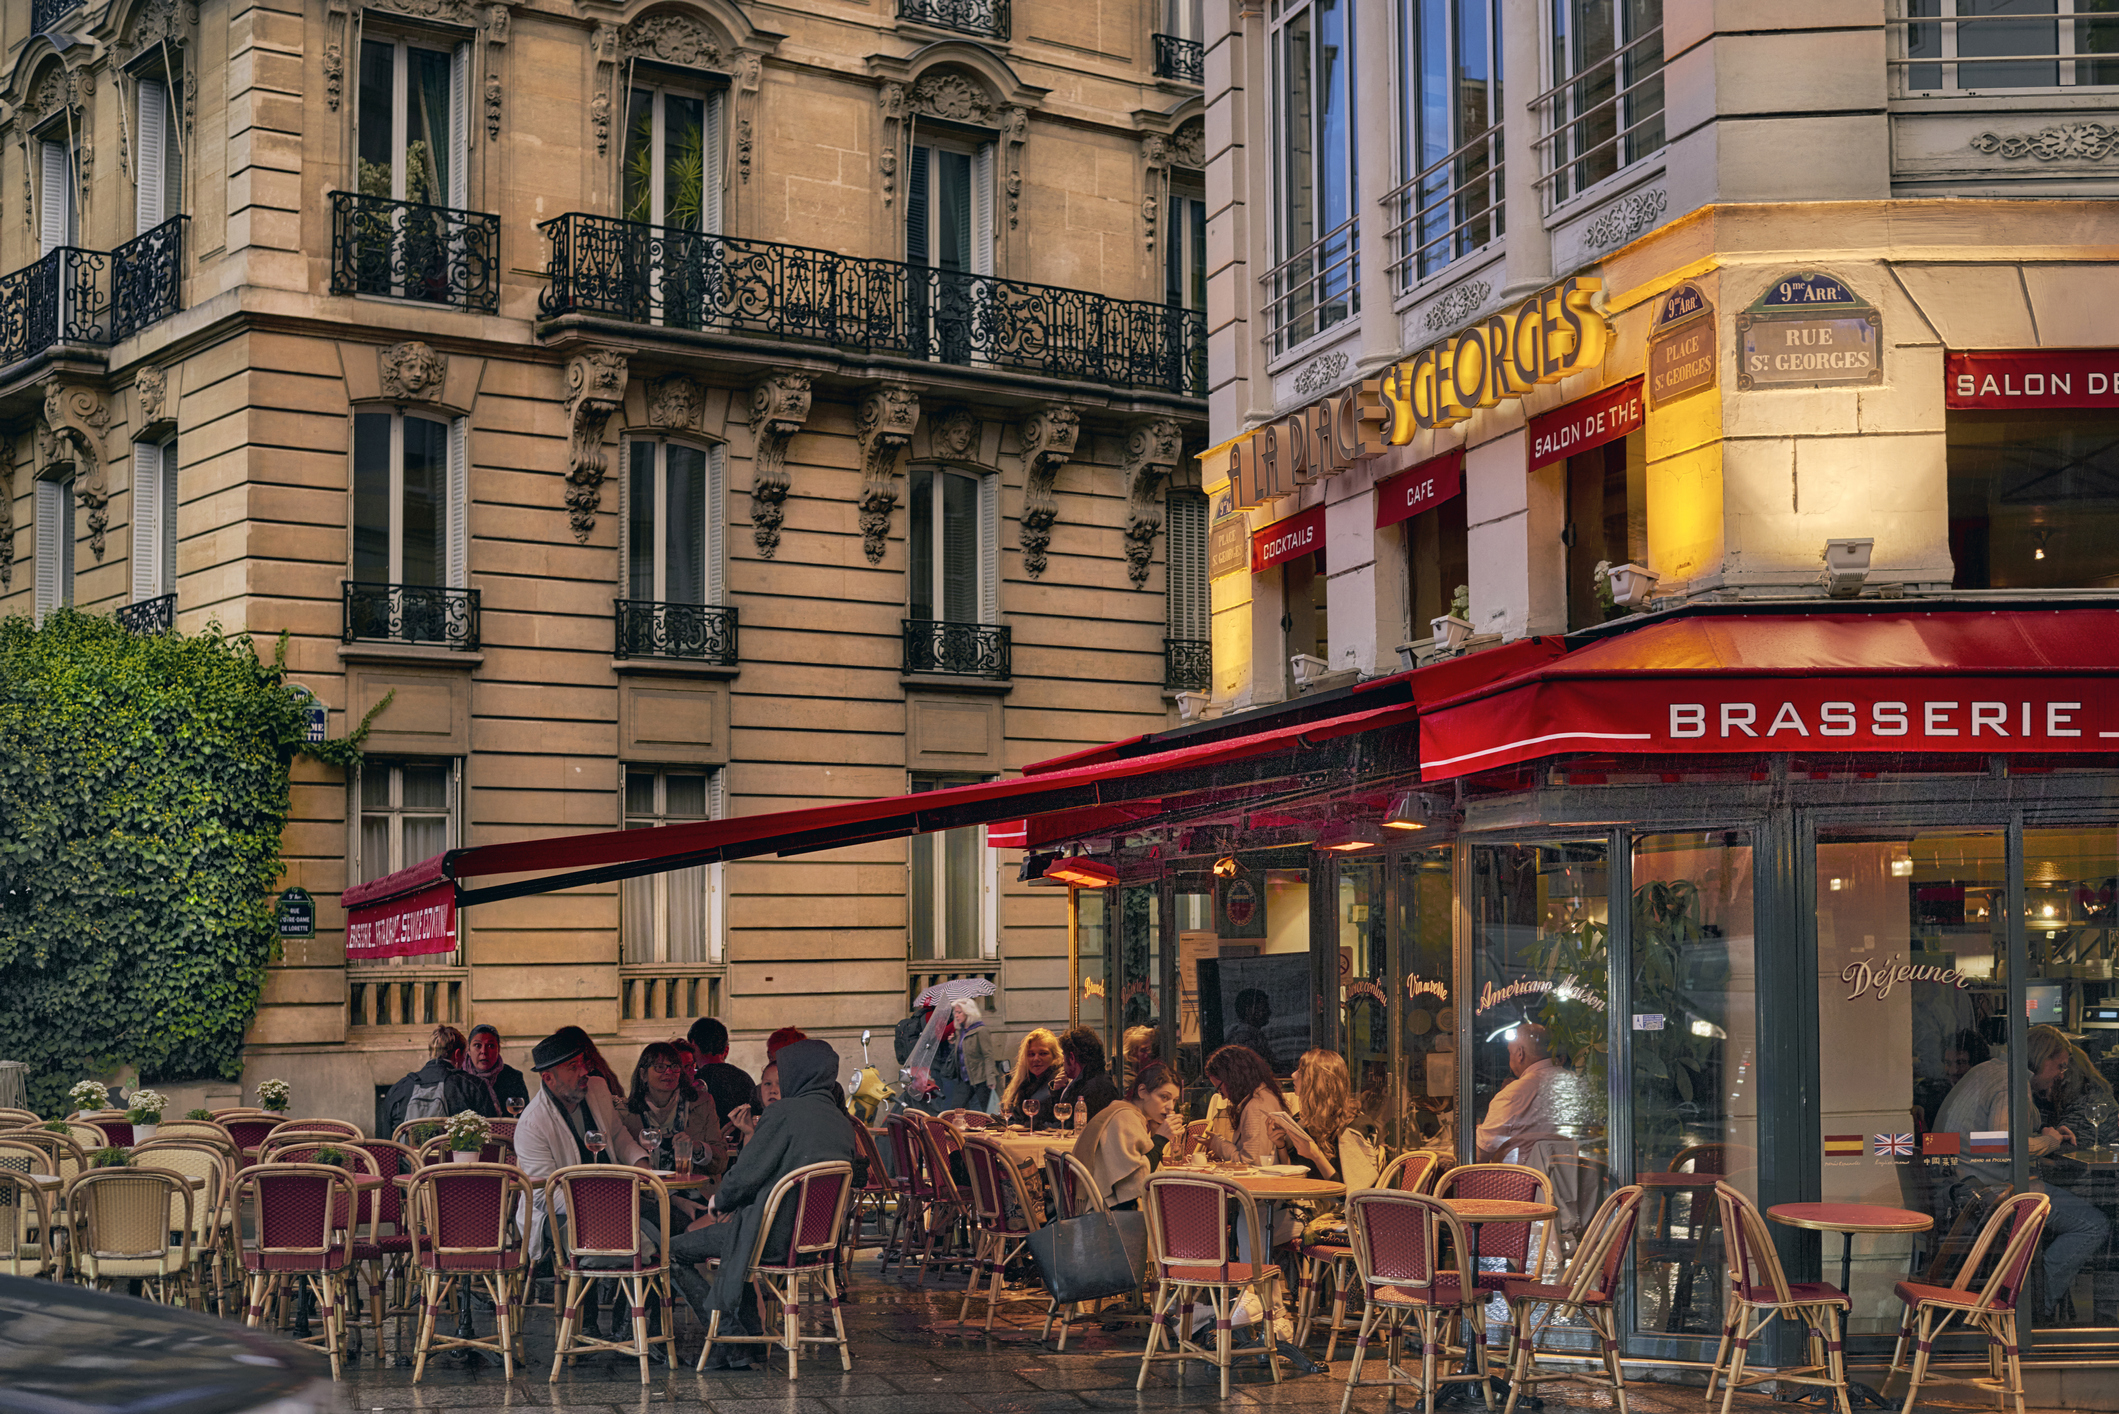 Café restaurant HSA